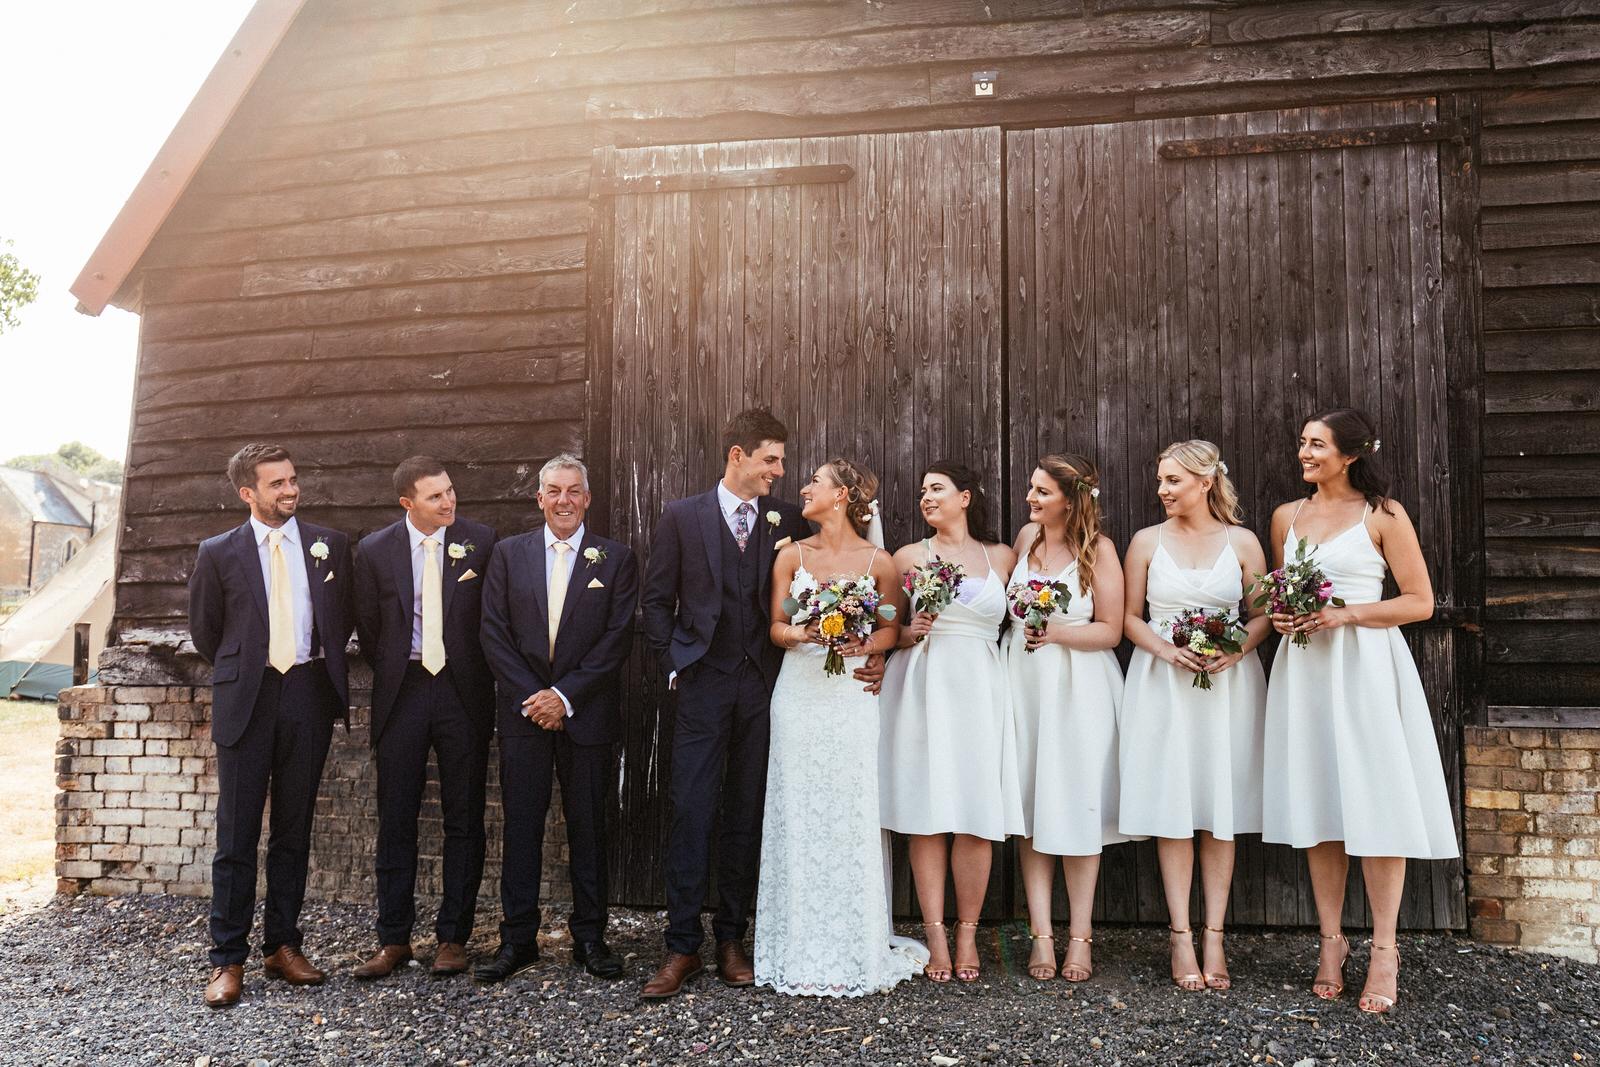 Edworth-Manor-Farm-Wedding-Photographer-044.jpg